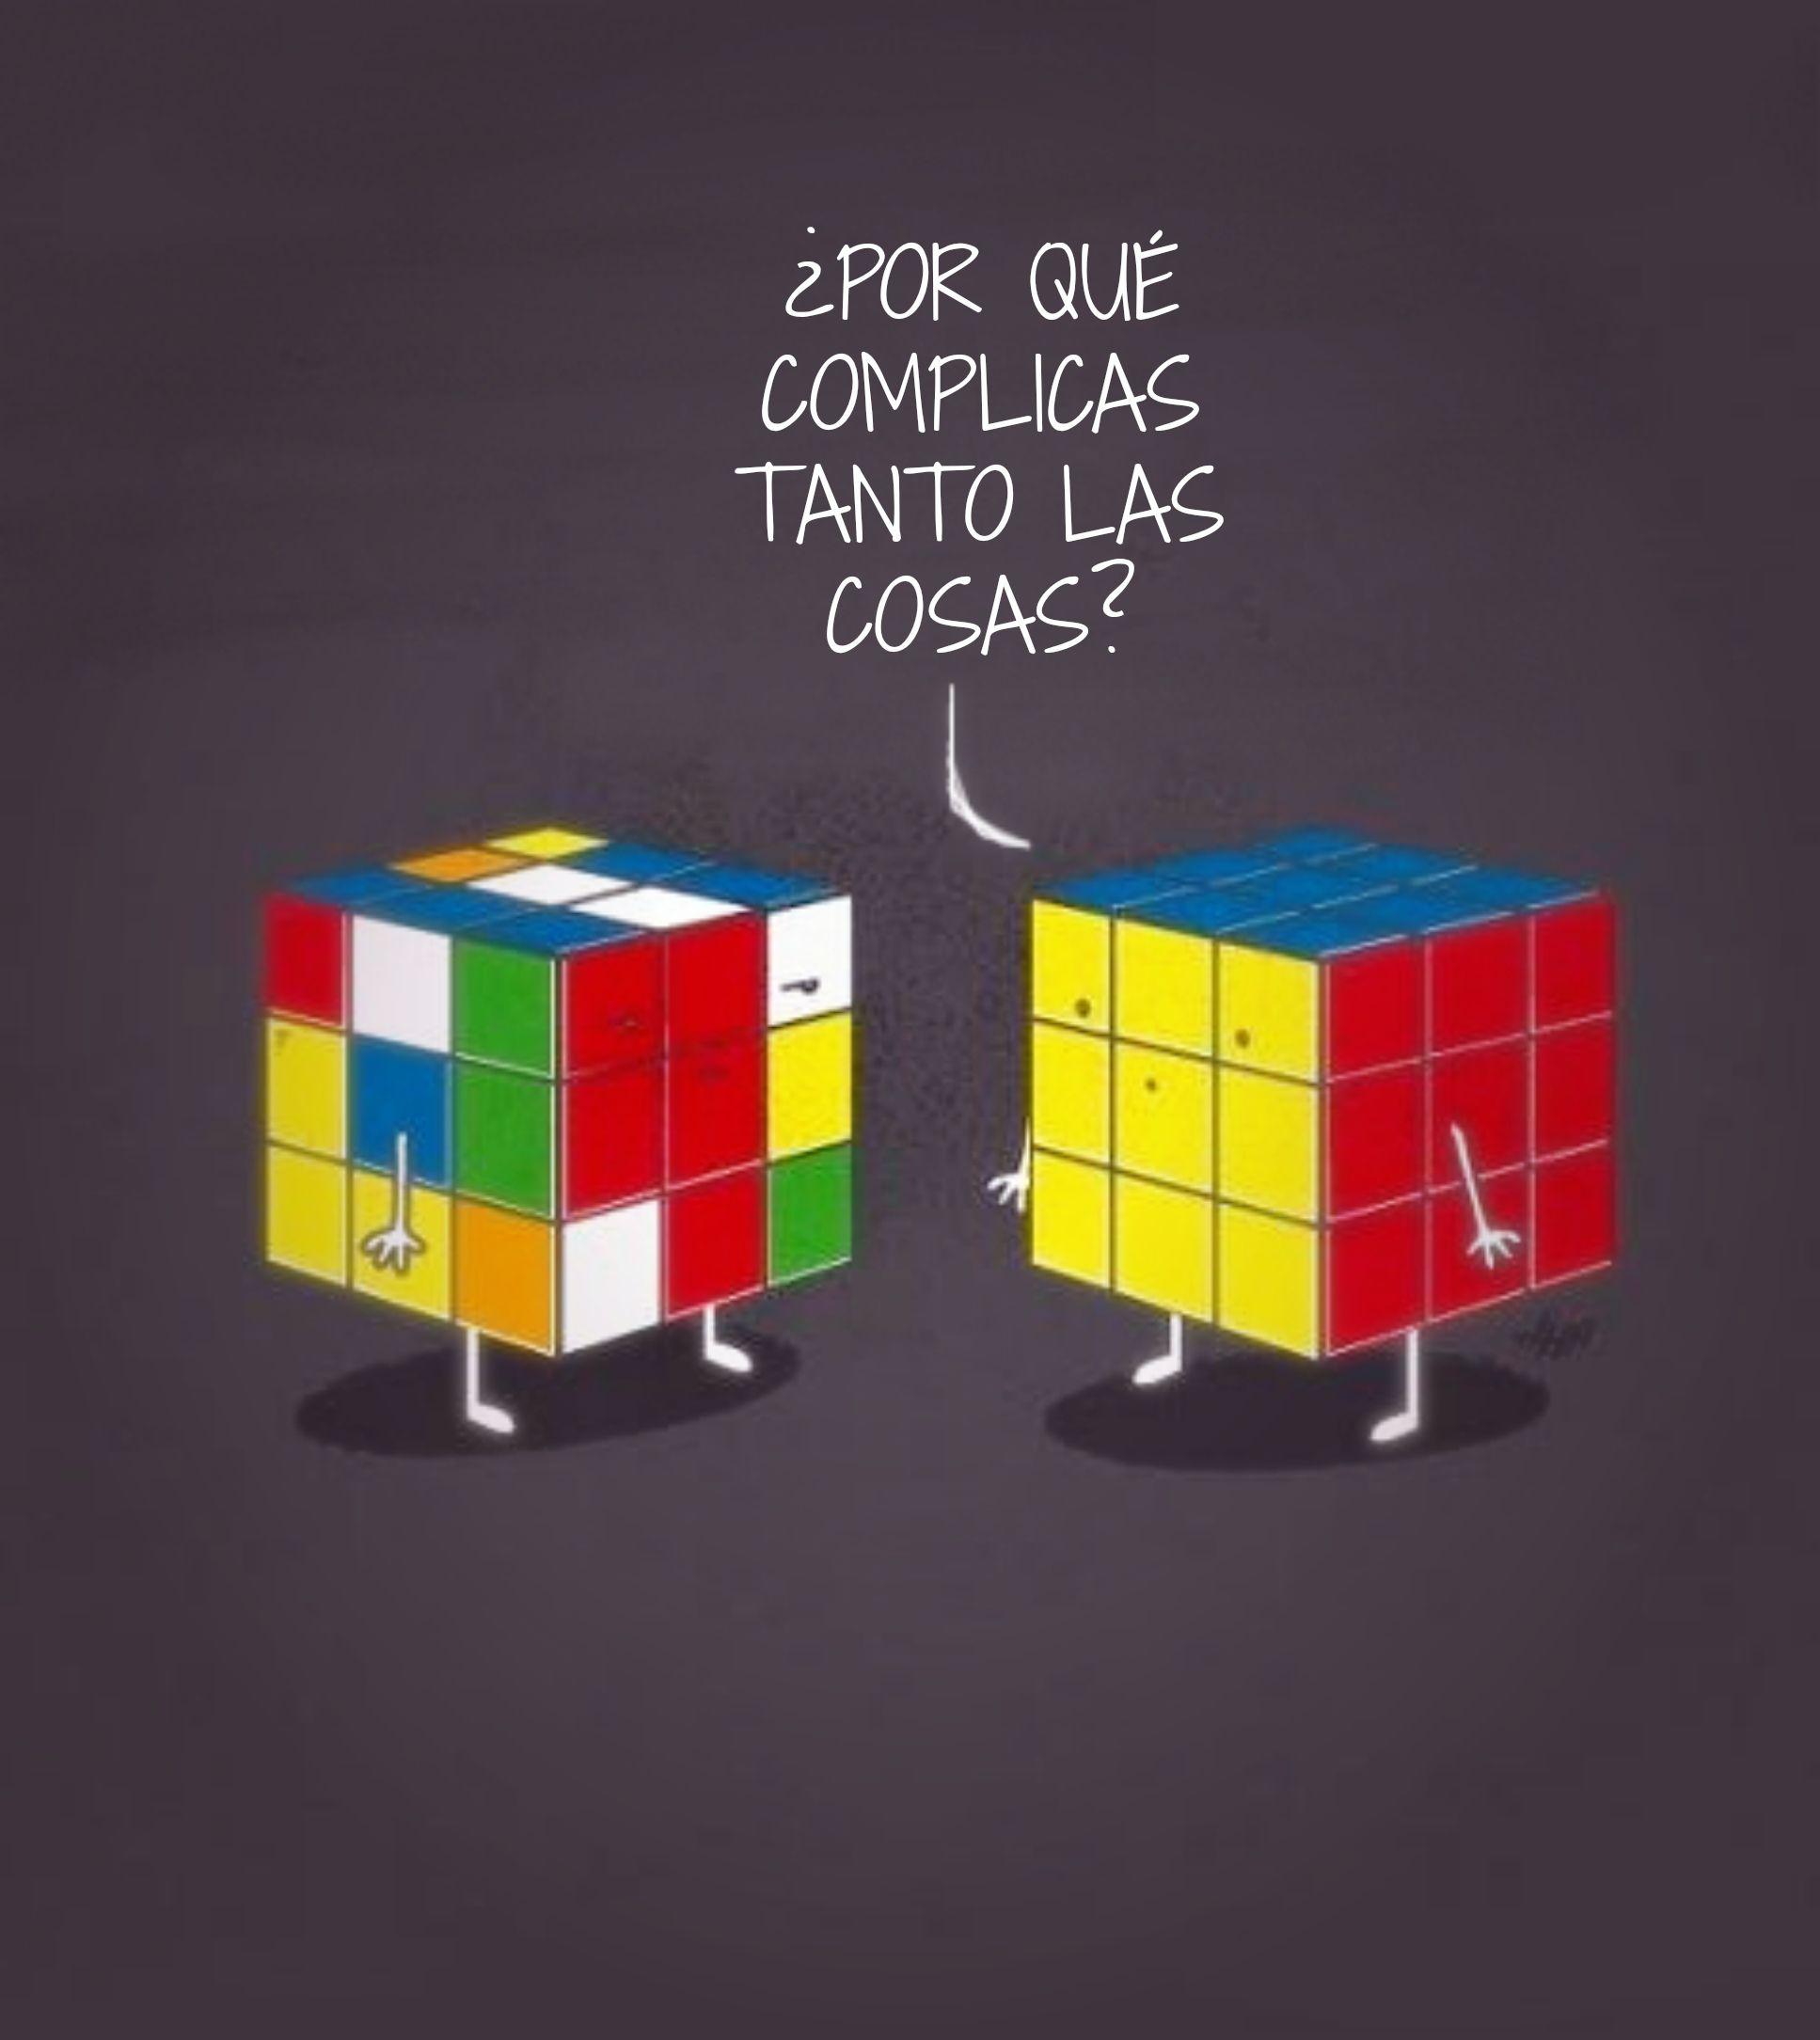 #amor #pareja #comico